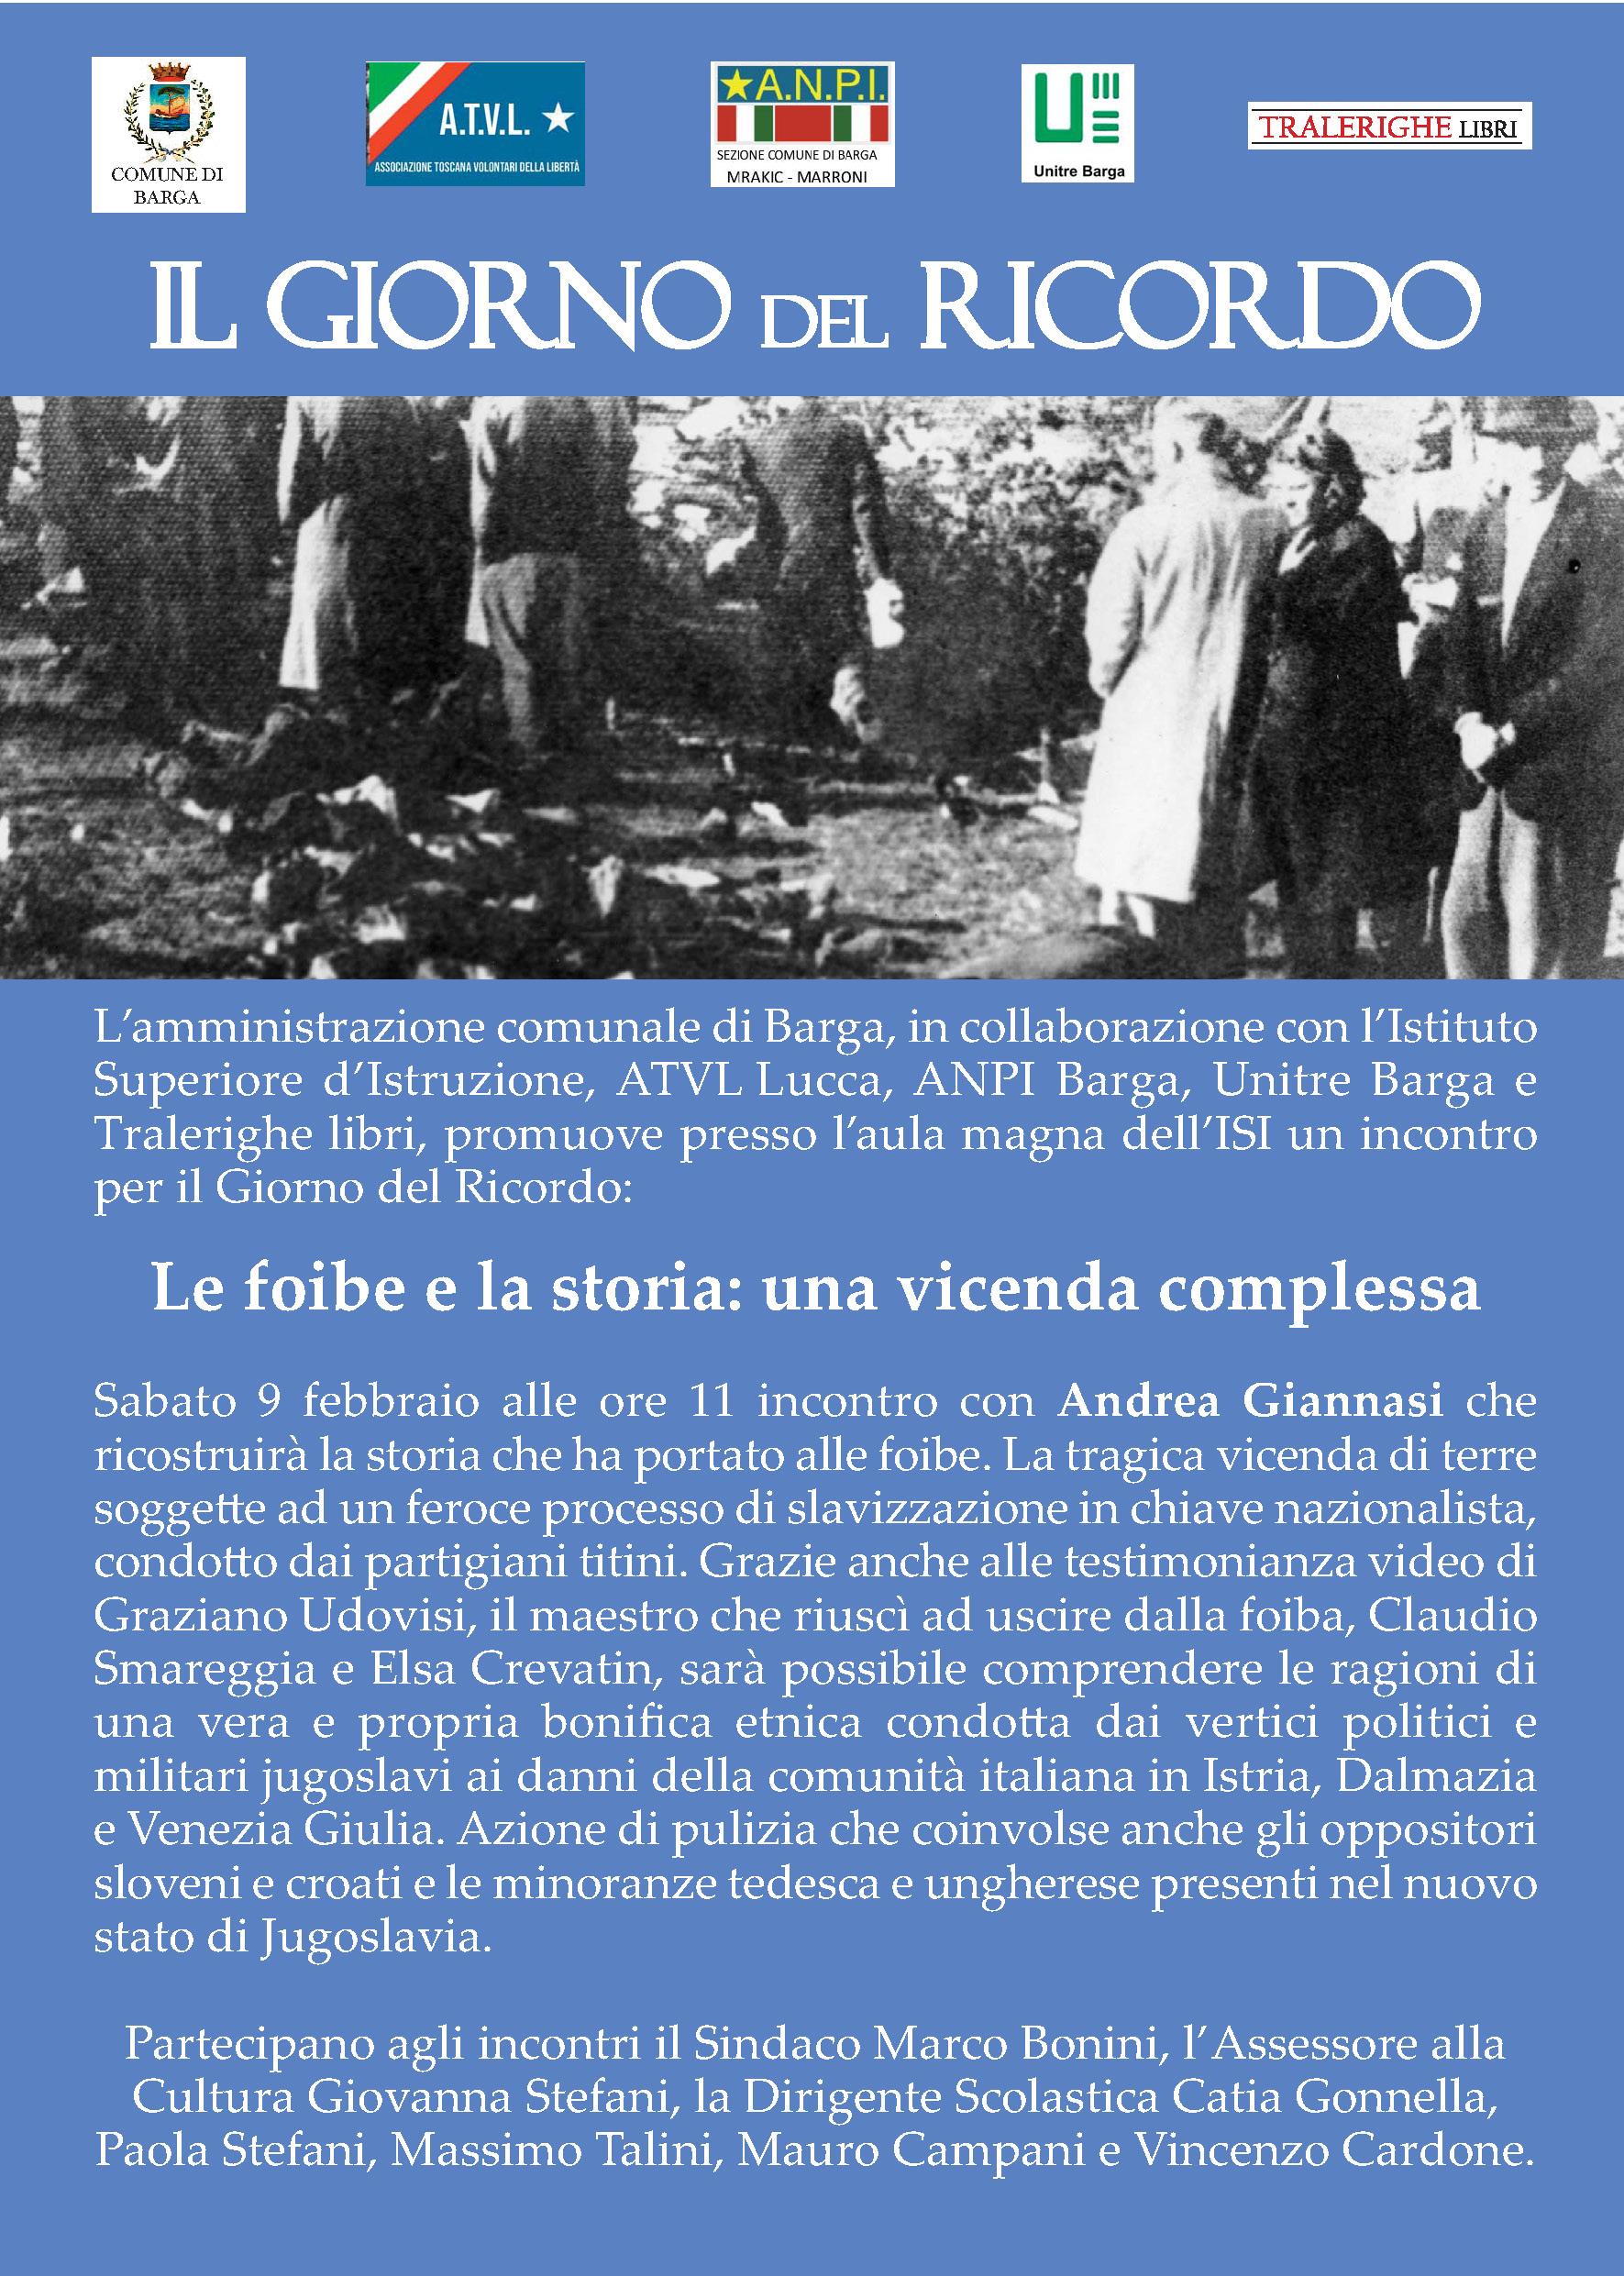 ricordo-barga-2019-manifesto-foibe